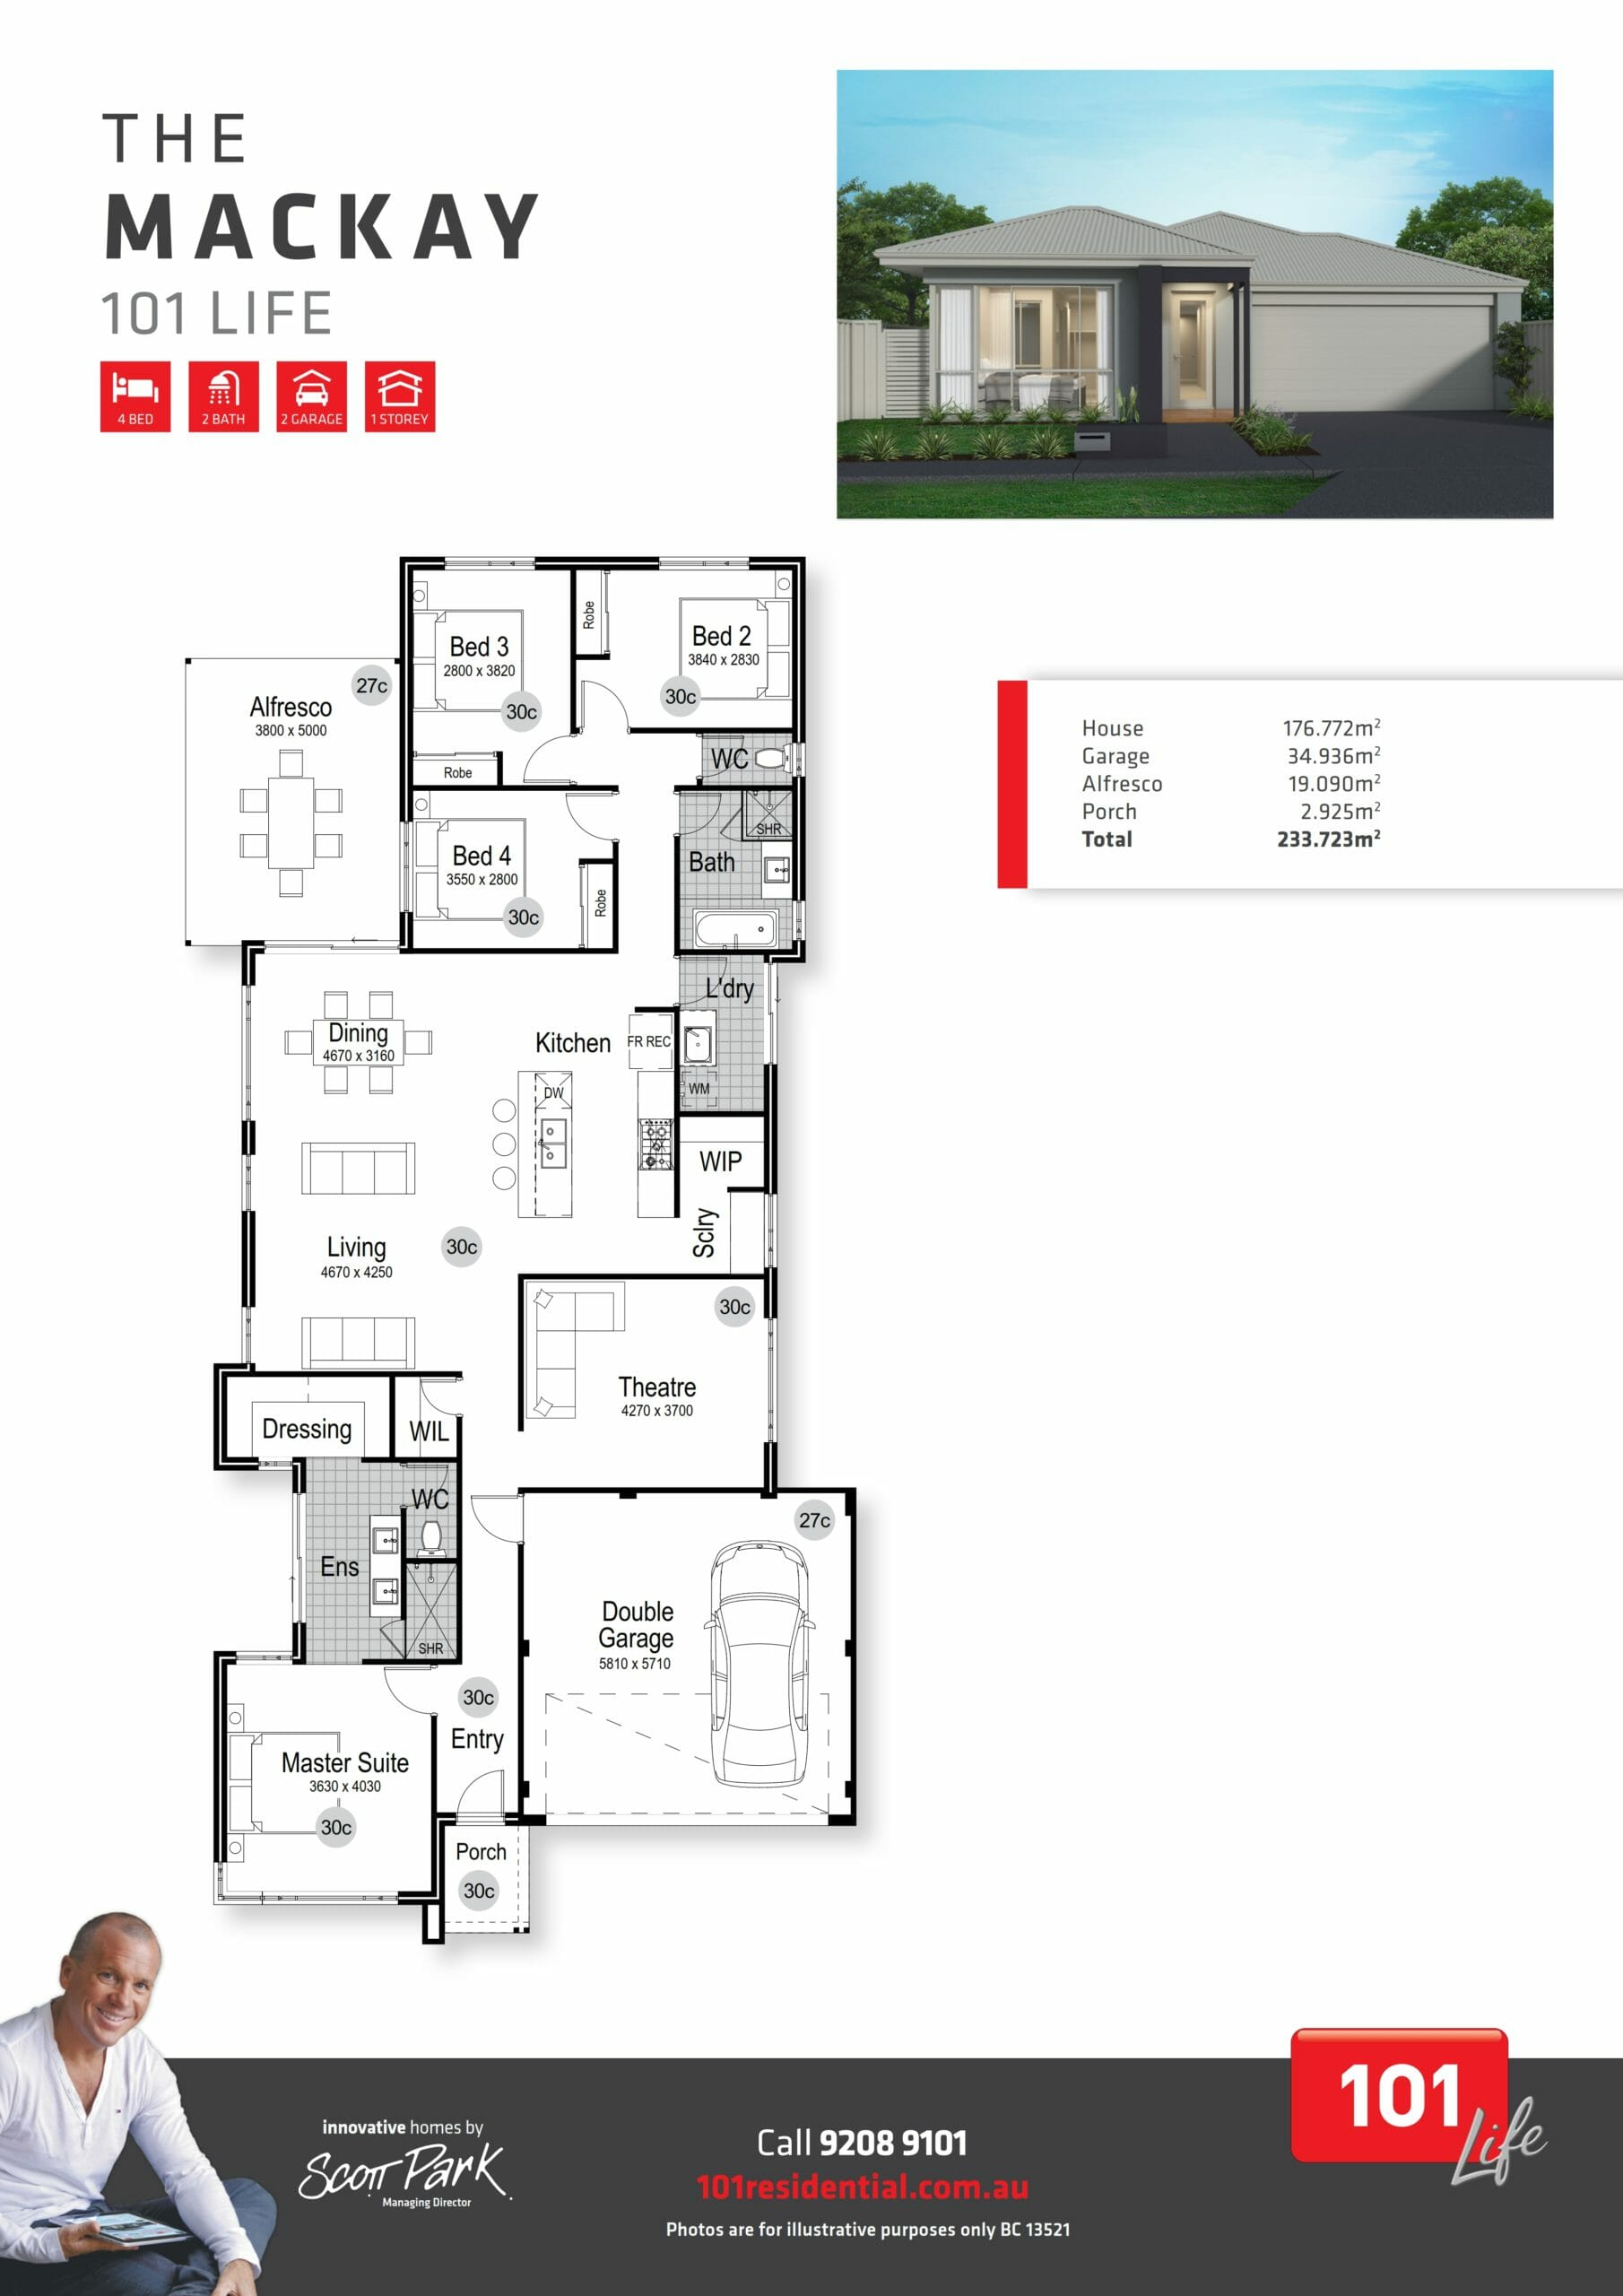 101 A3 Floor Plan - Mackay WEB_001